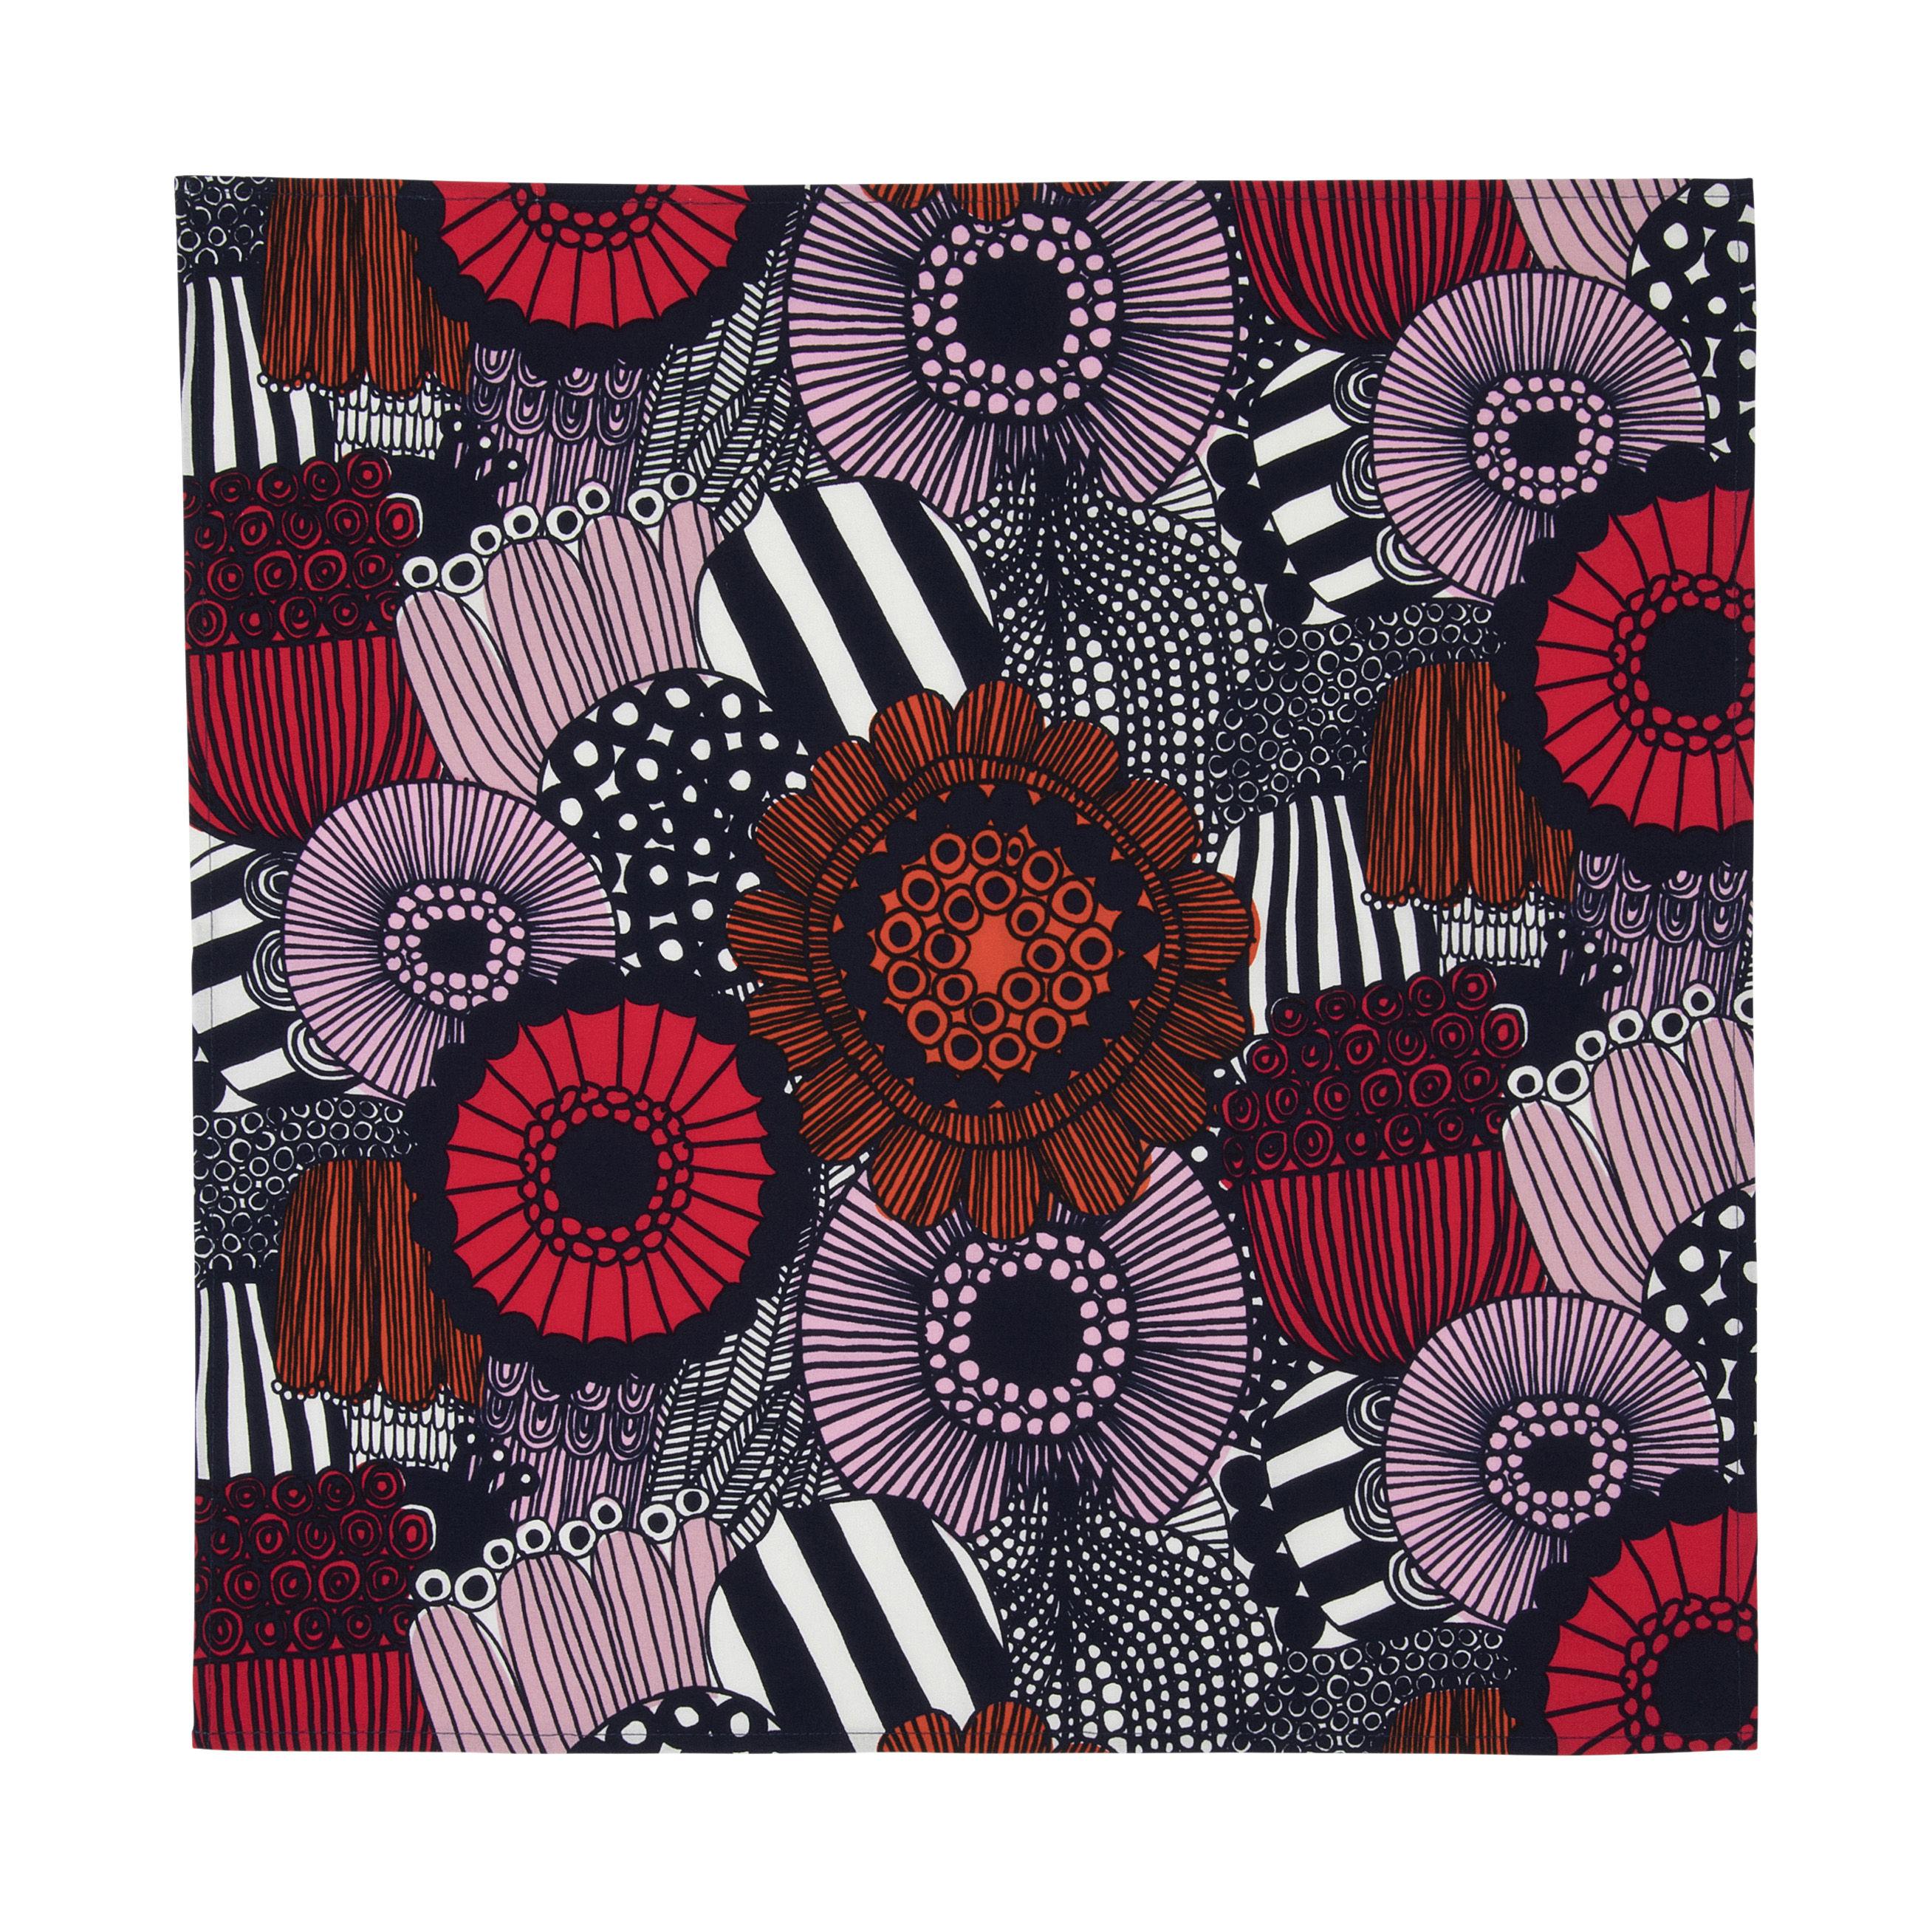 Arts de la table - Nappes, serviettes et sets - Serviette de table Pieni Siirtolapuutarha / Coton - 47 x 47 cm - Marimekko - Siirtolapuutarha / Tons rouges - Coton